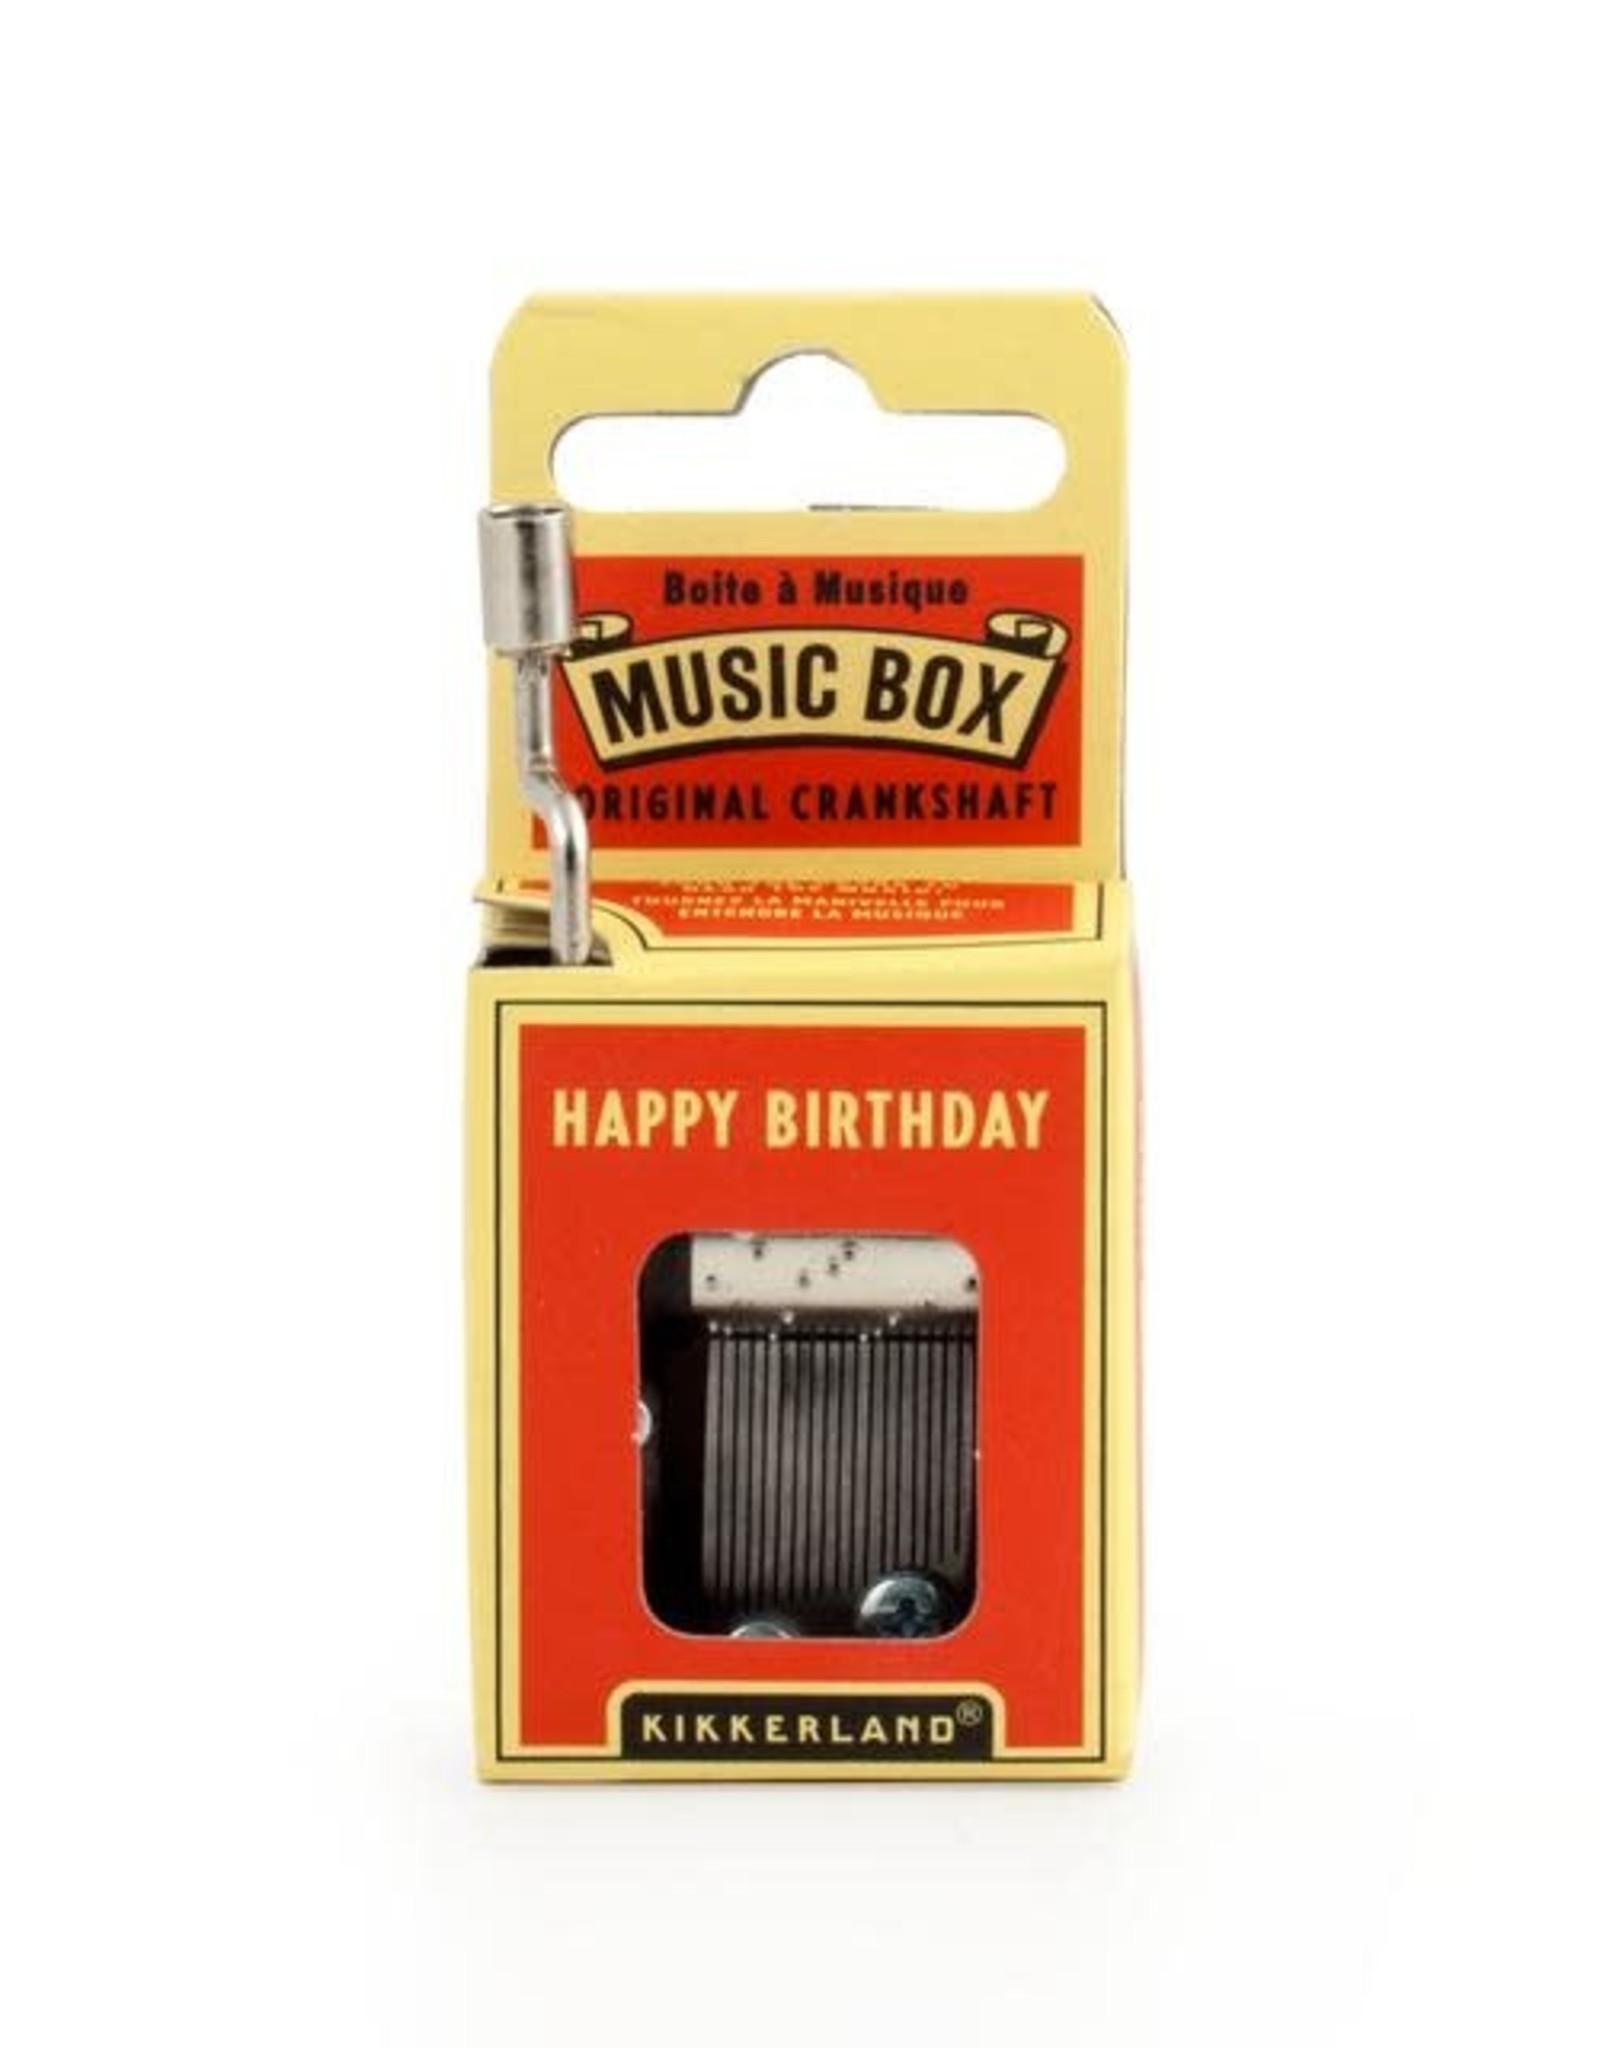 Kikkerland Hand Crank Music Box, Happy Birthday - Kikkerland